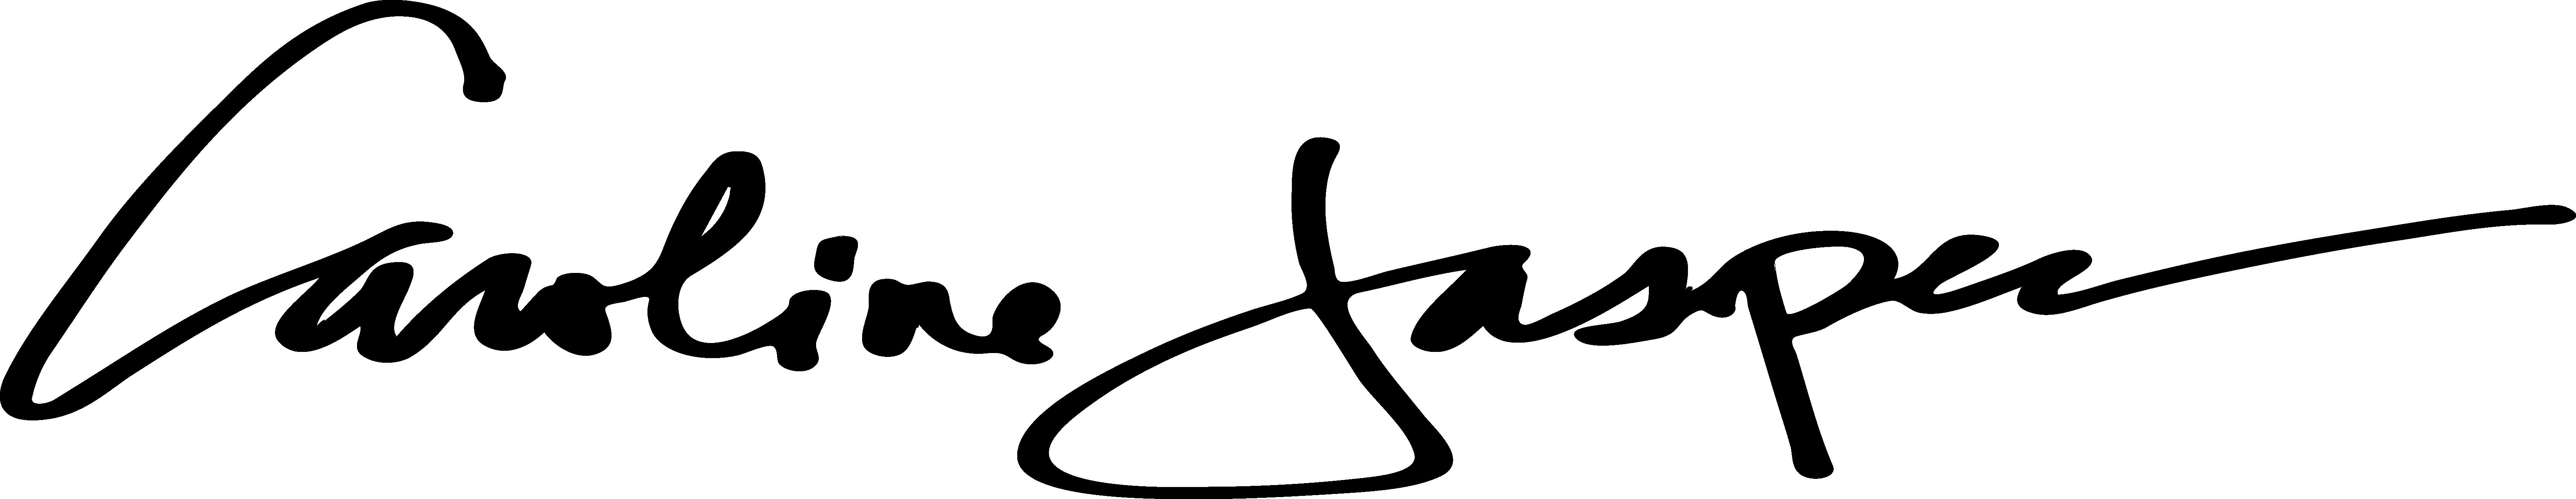 CAROLINE JASPER's Signature